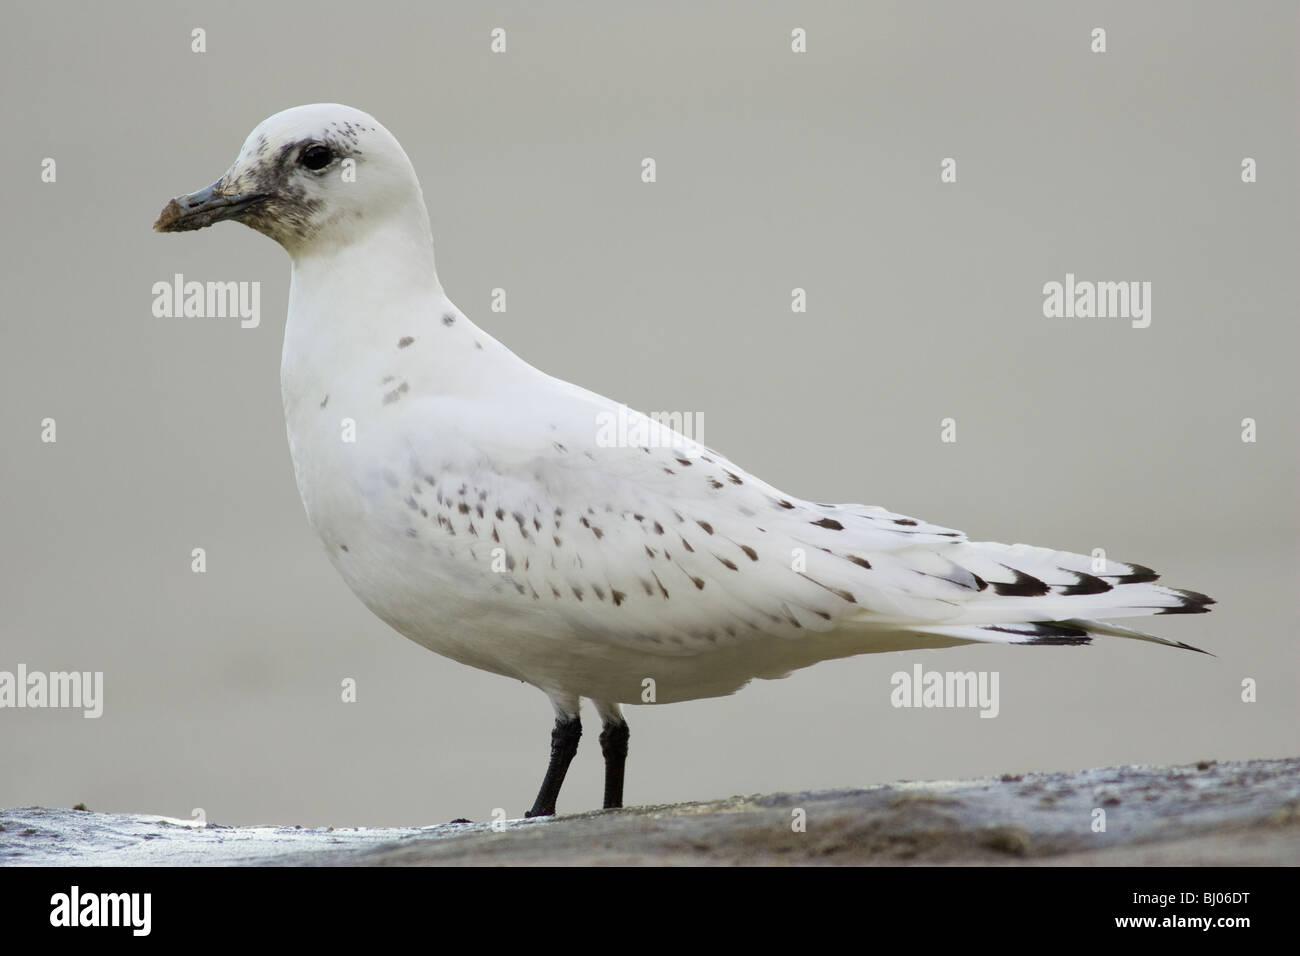 First-winter Ivory Gull (Pagophila eburnea) standing on a dead Minke Whale carcase - Stock Image